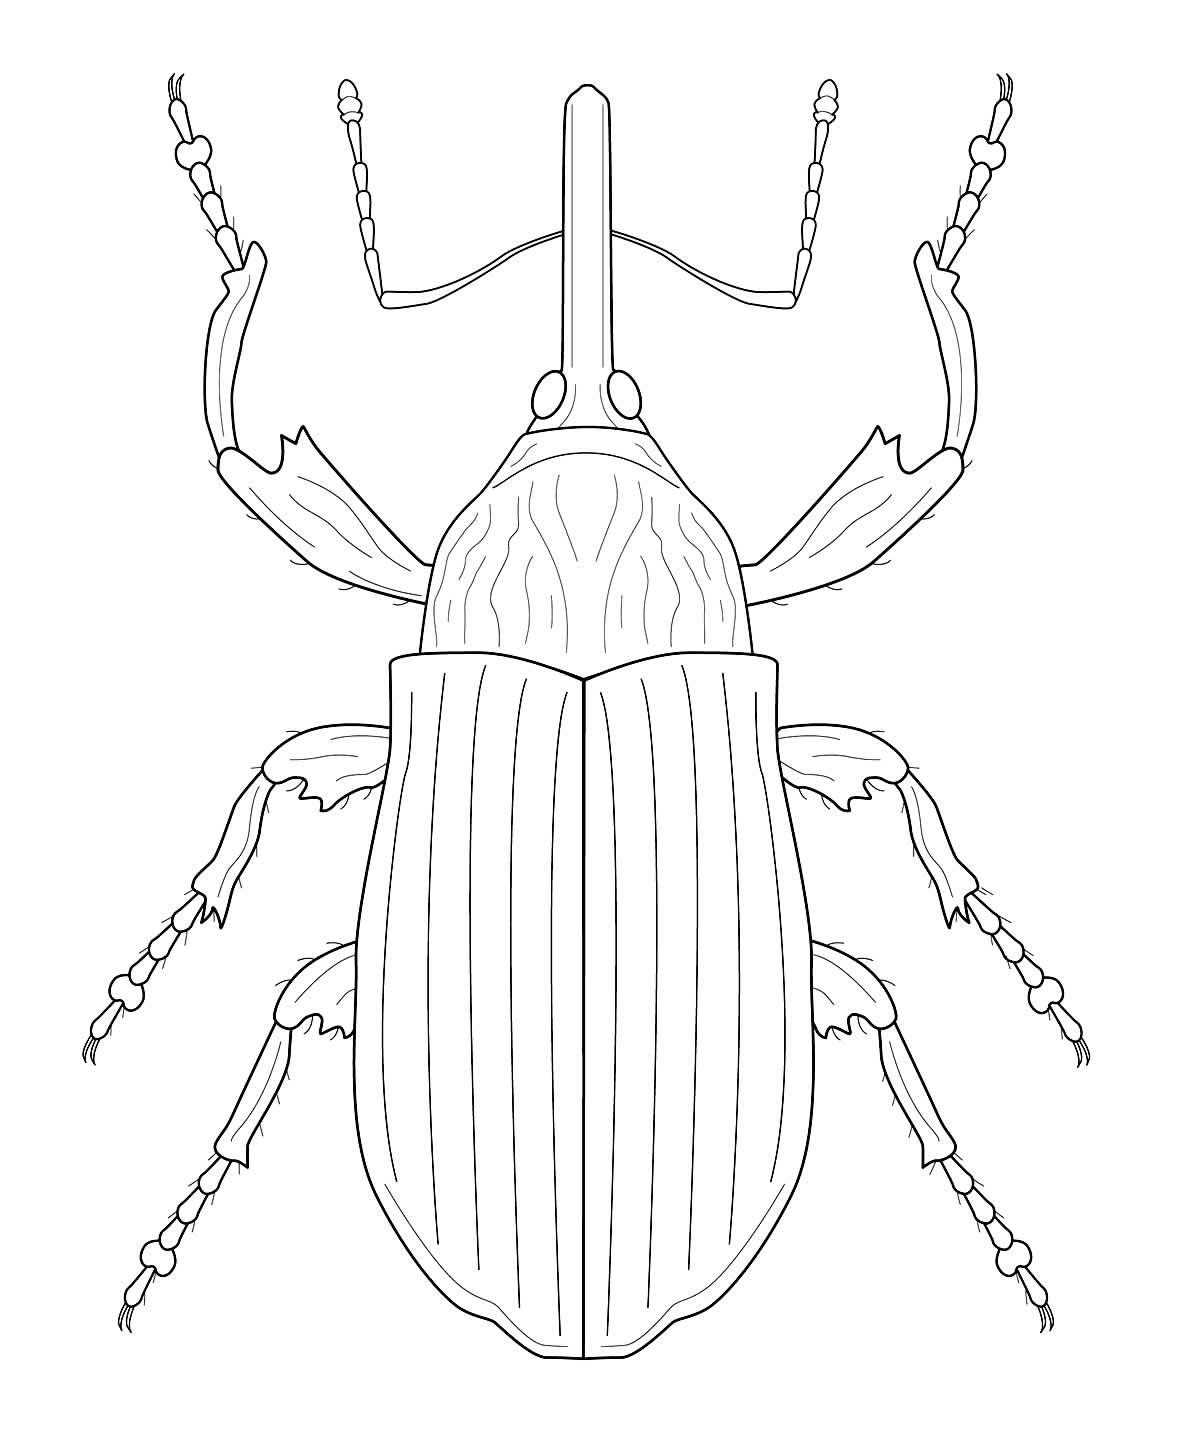 Molde de inseto para imprimir